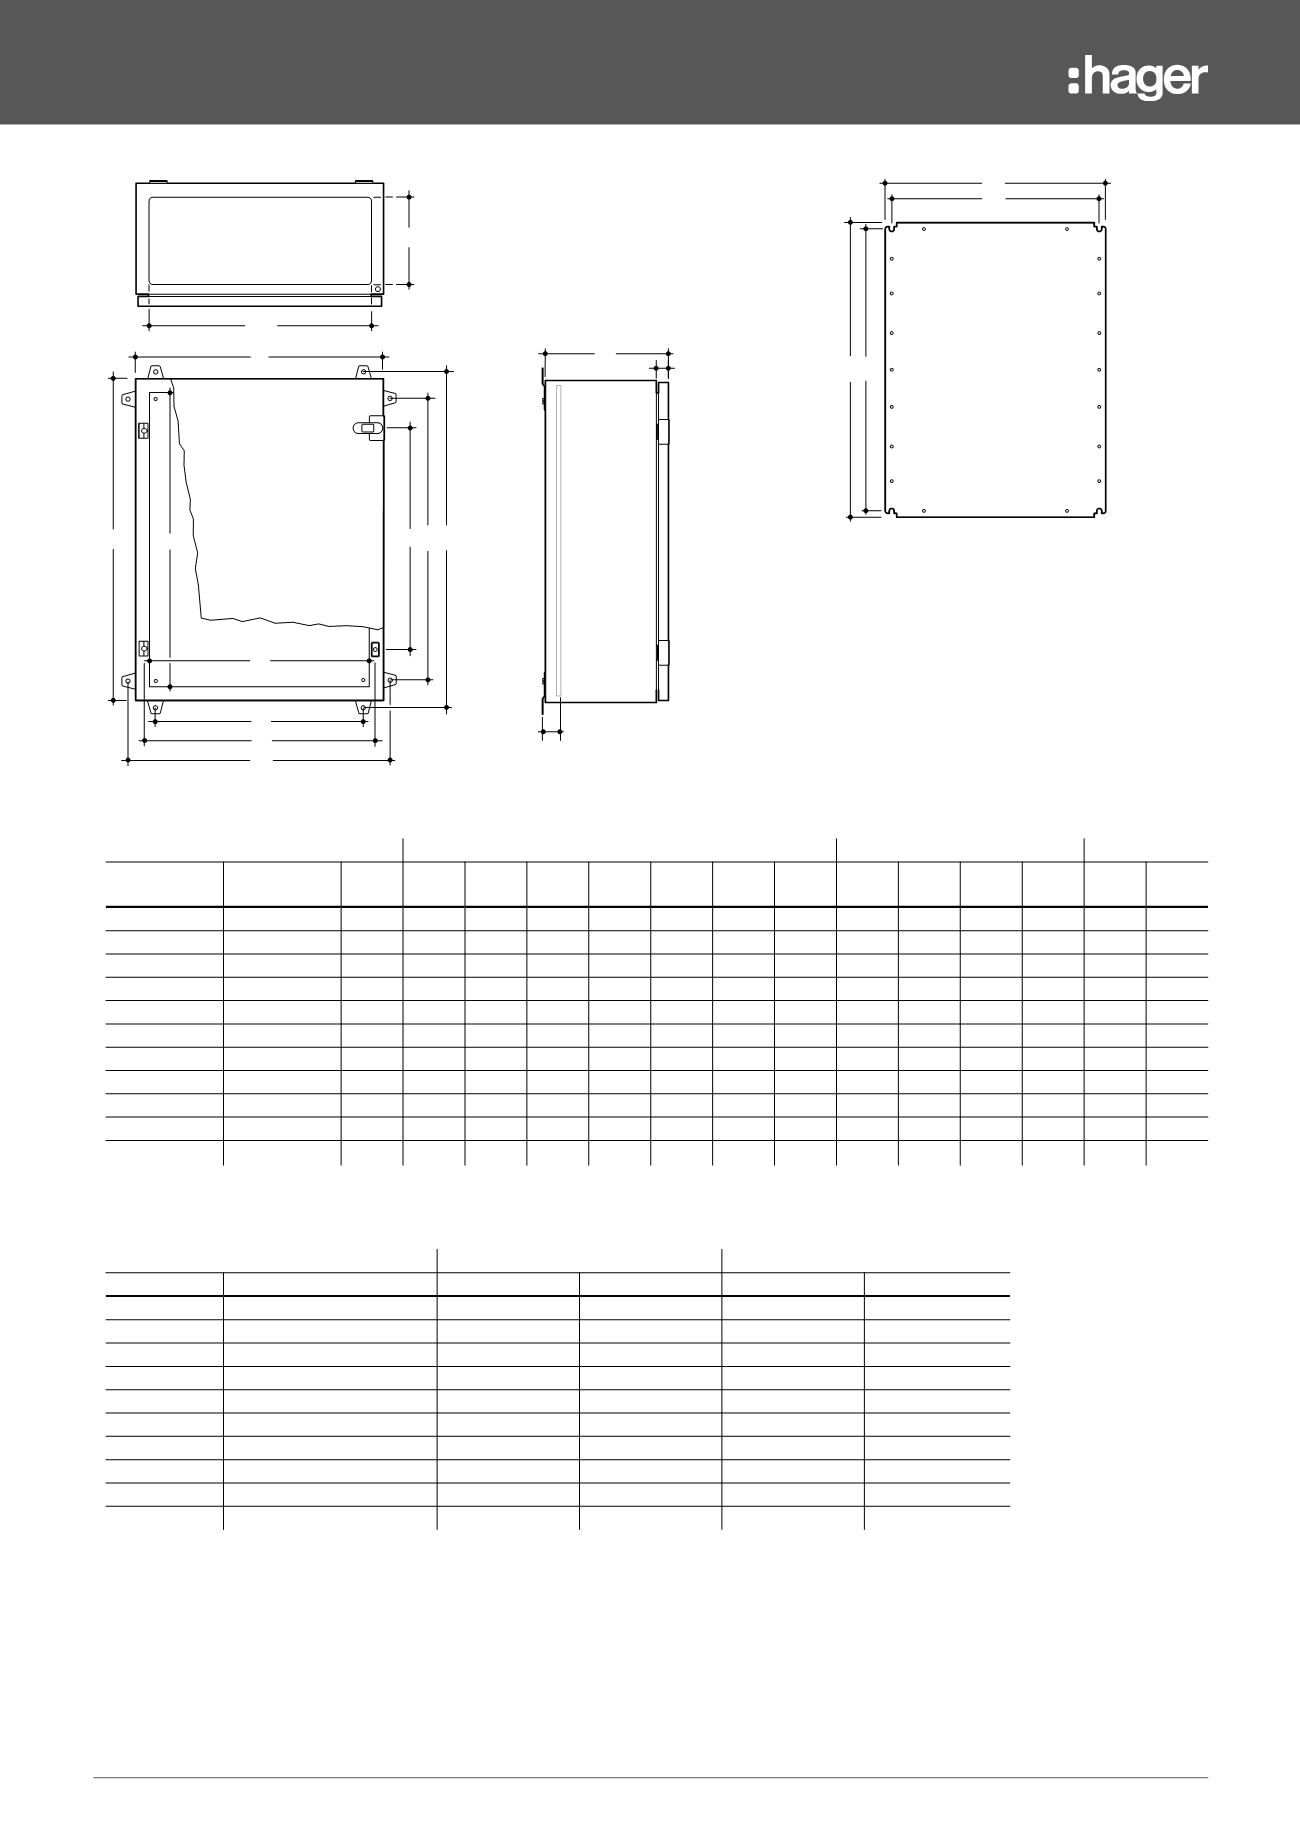 hager general catalogue 2017 18. Black Bedroom Furniture Sets. Home Design Ideas